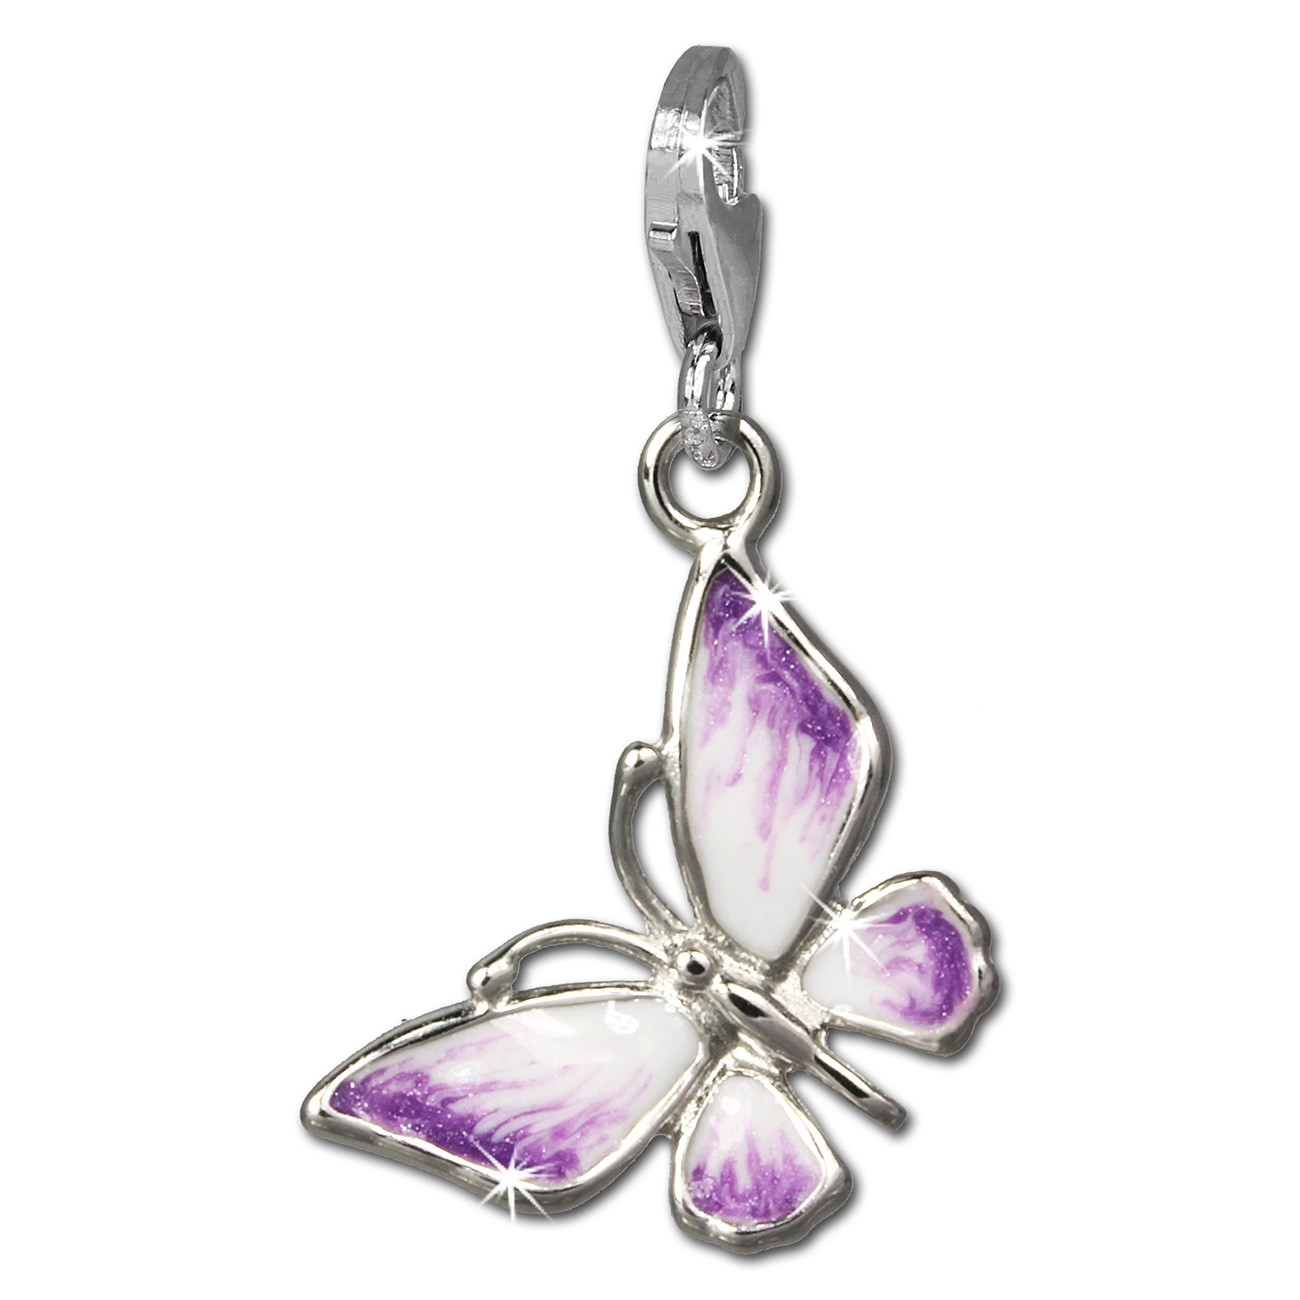 SilberDream Charm Schmetterling lila/weiß 925 Armband Anhänger FC825V